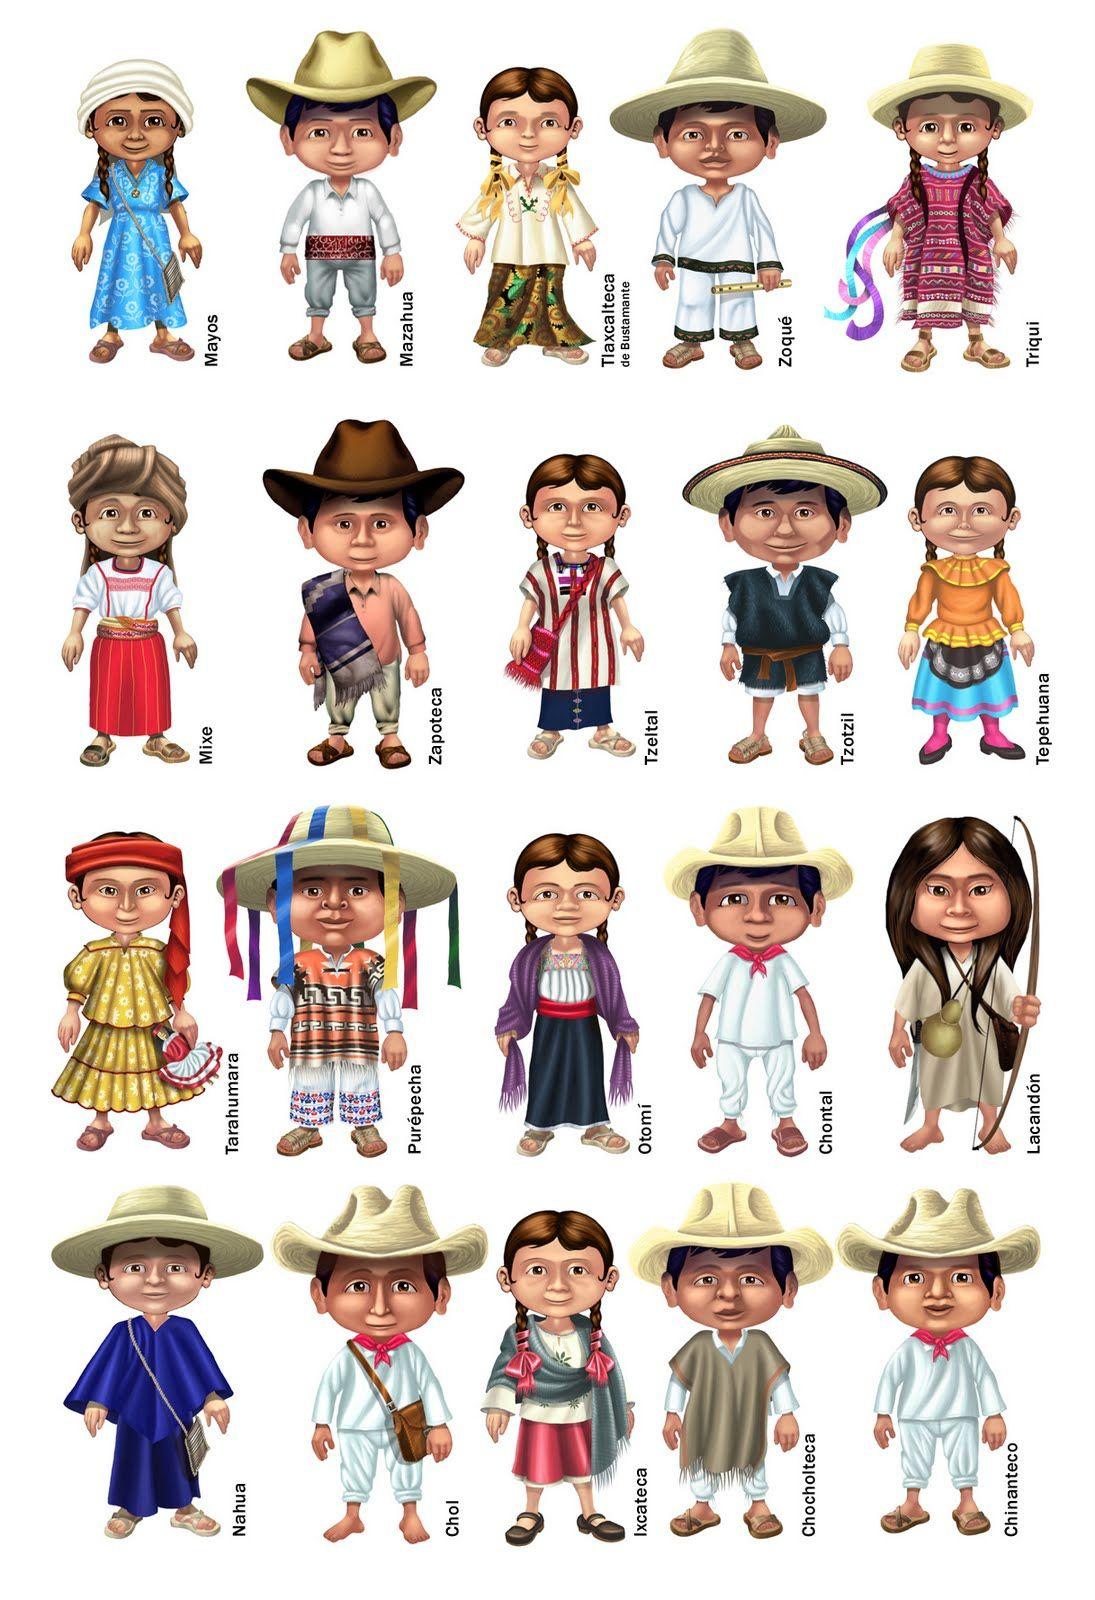 Trajes tipicos  folkloarte Mxico vivo y vibrante  Pinterest